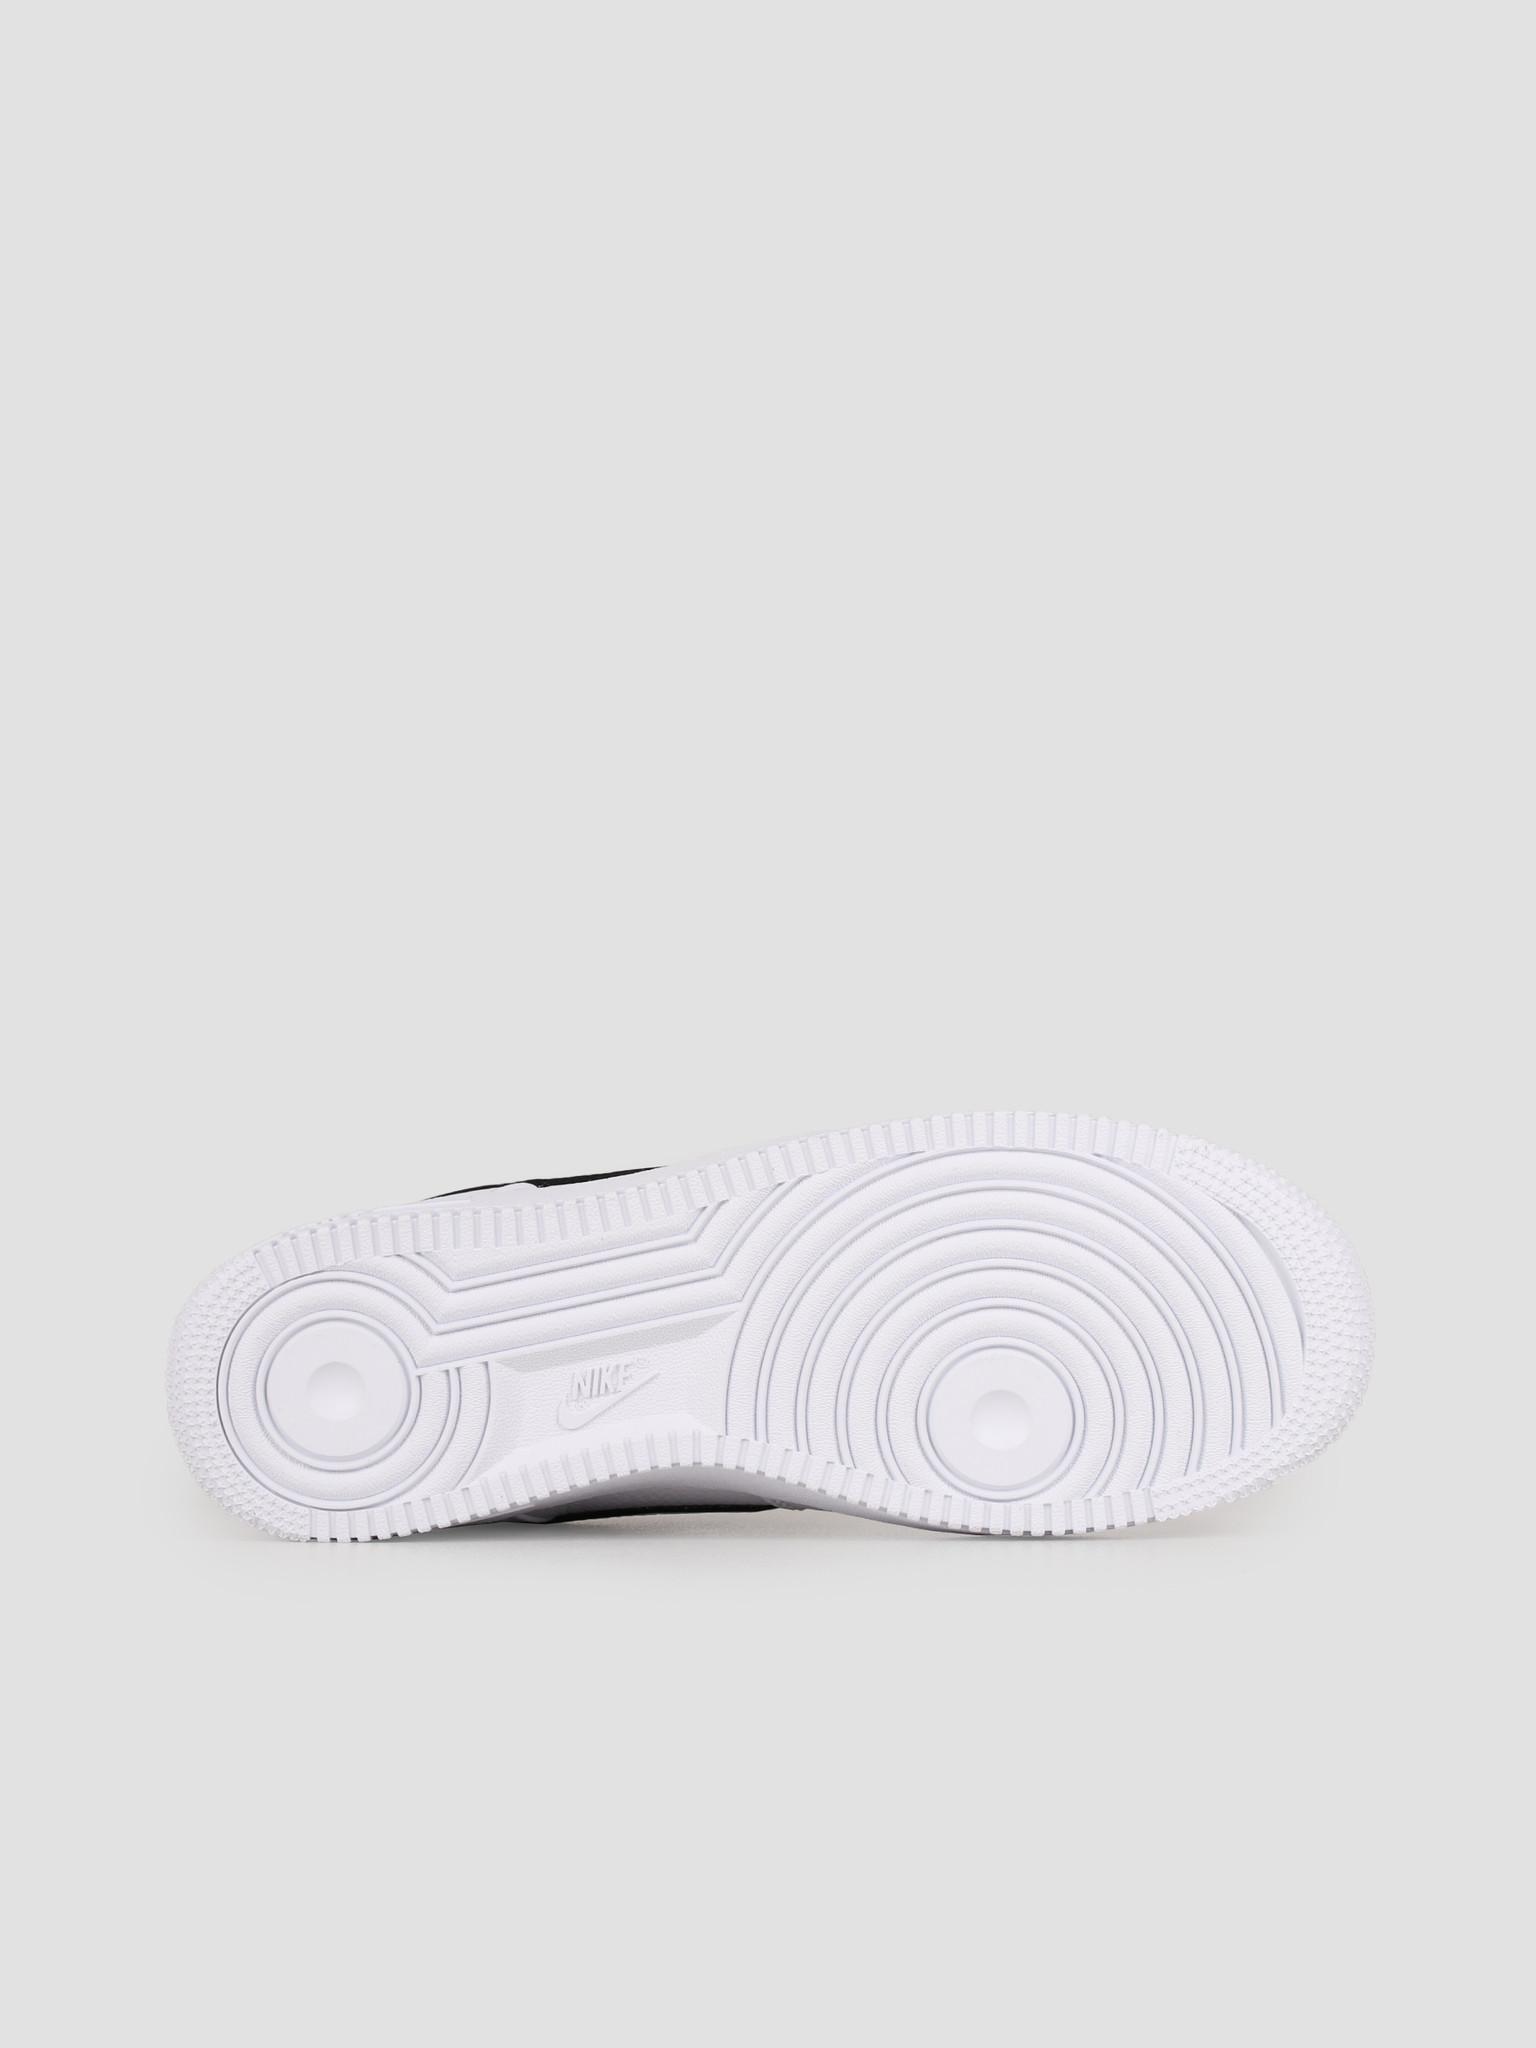 Nike Nike Air Force 1 07 PRM 2 White Black AT4143-102